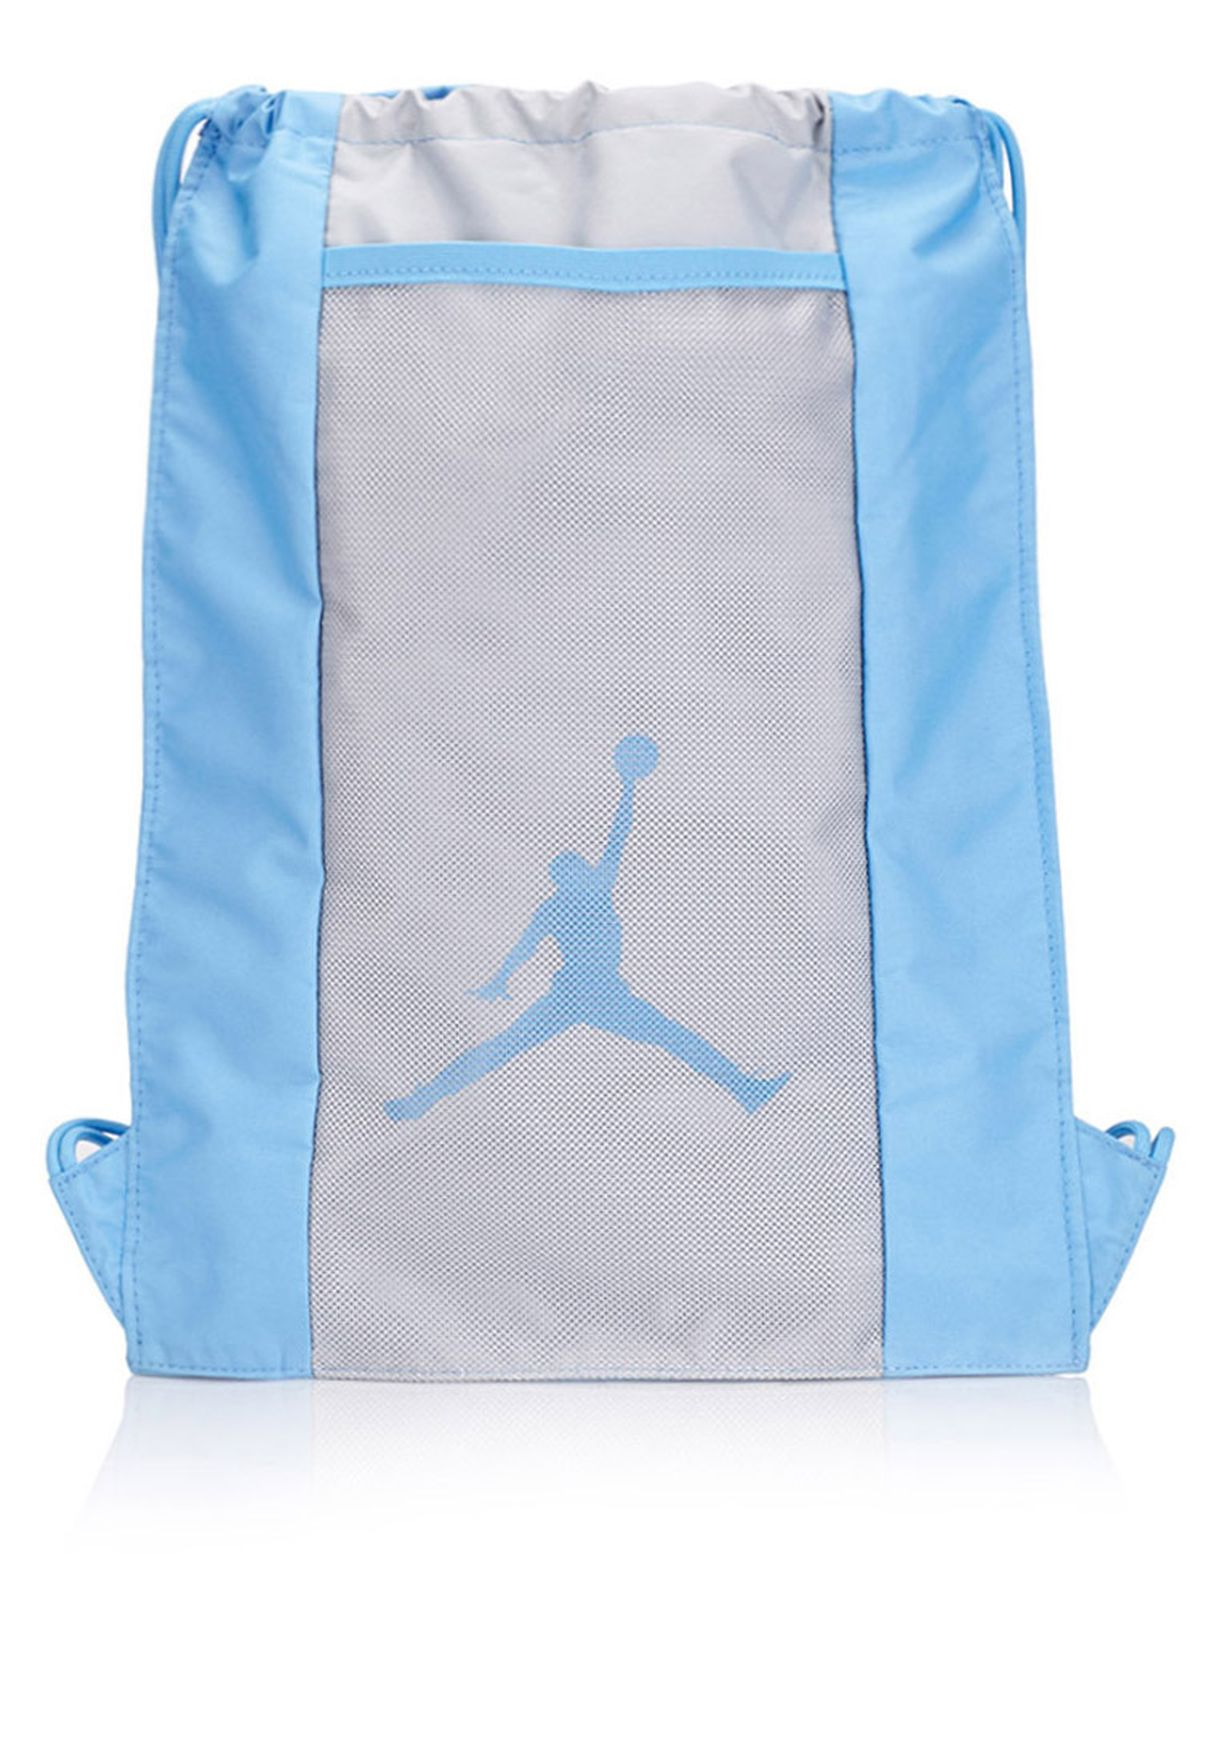 1c98b6a865bf Shop Nike blue Jordan Dominate Gymsack 612839-412 for Men in Saudi -  NI727AC26JIB